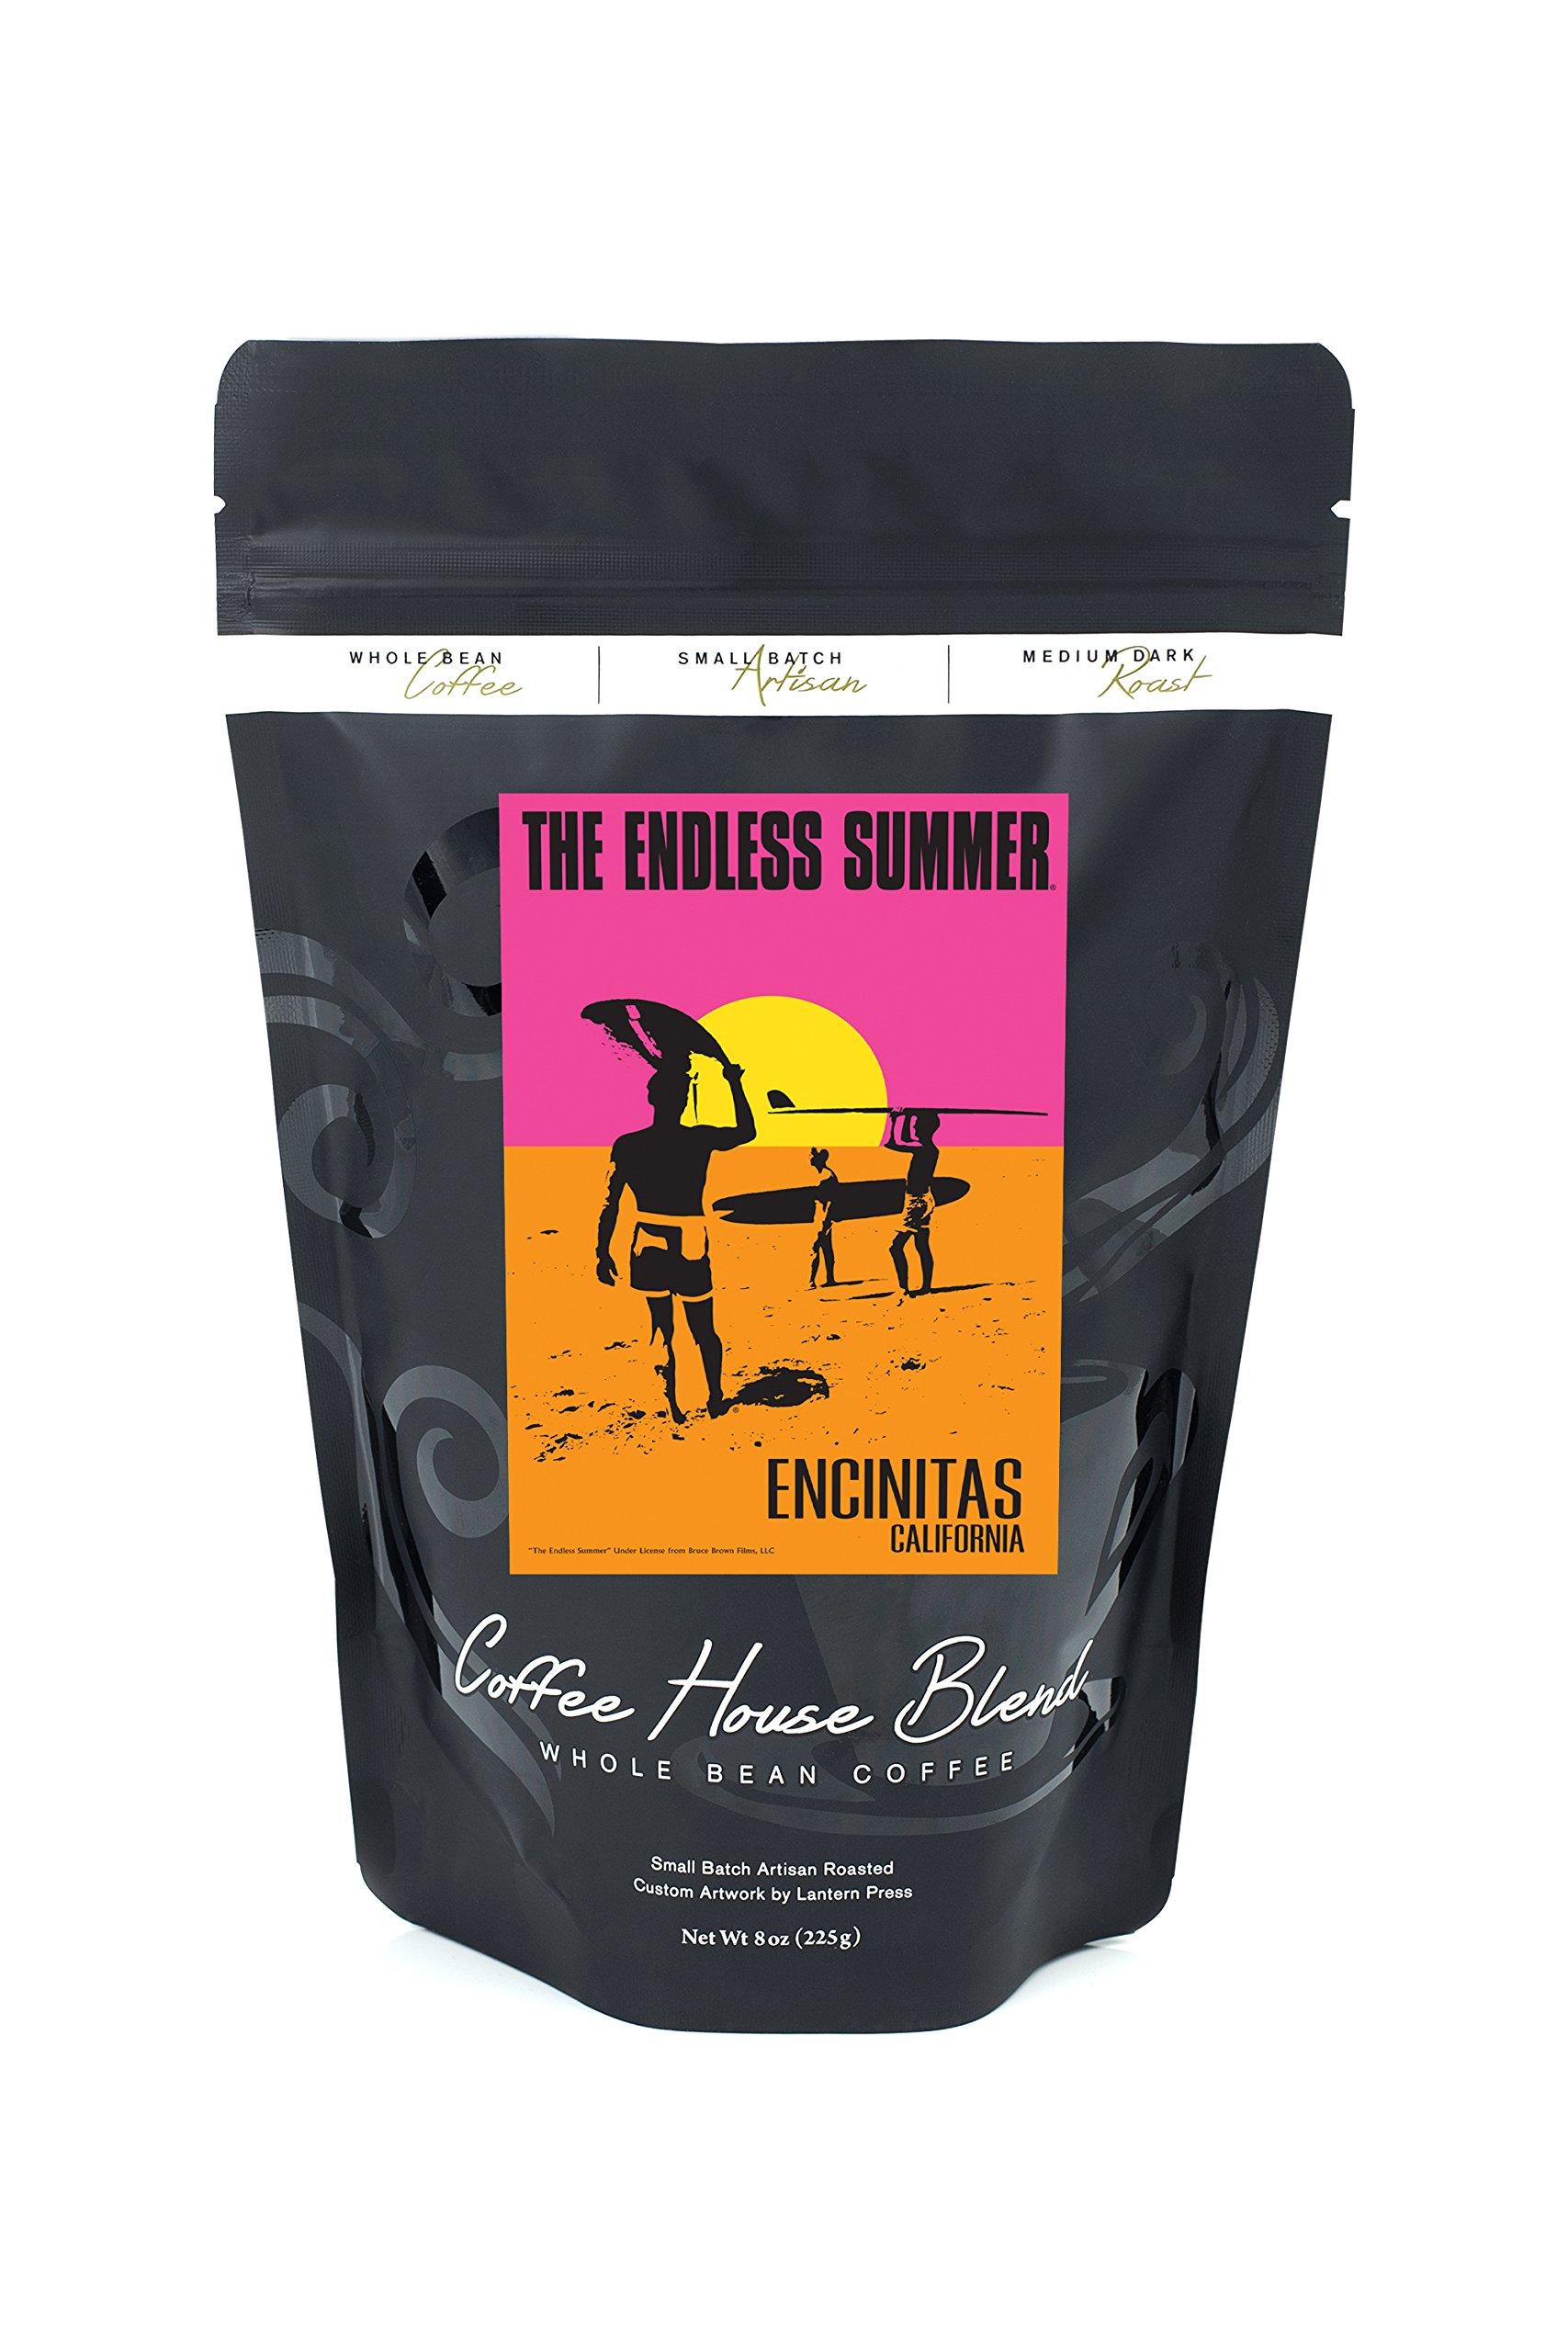 Encinitas, California - The Endless Summer - Original Movie Poster (8oz Whole Bean Small Batch Artisan Coffee - Bold & Strong Medium Dark Roast w/ Artwork)